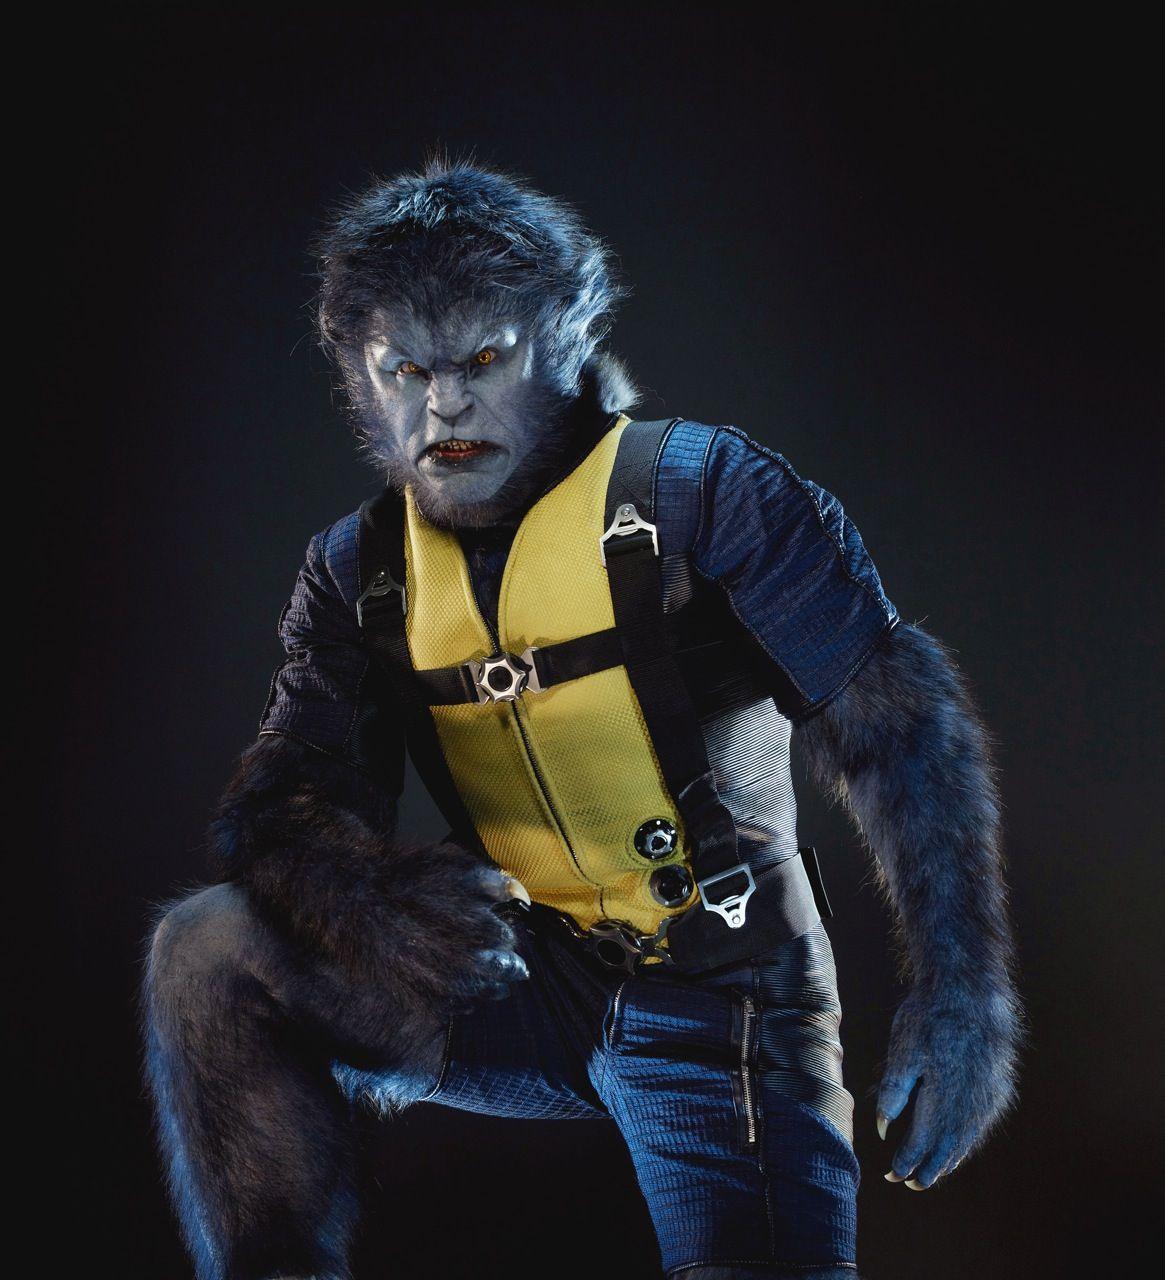 X-MEN: DAYS OF FUTURE PAST Beast Image | Collider